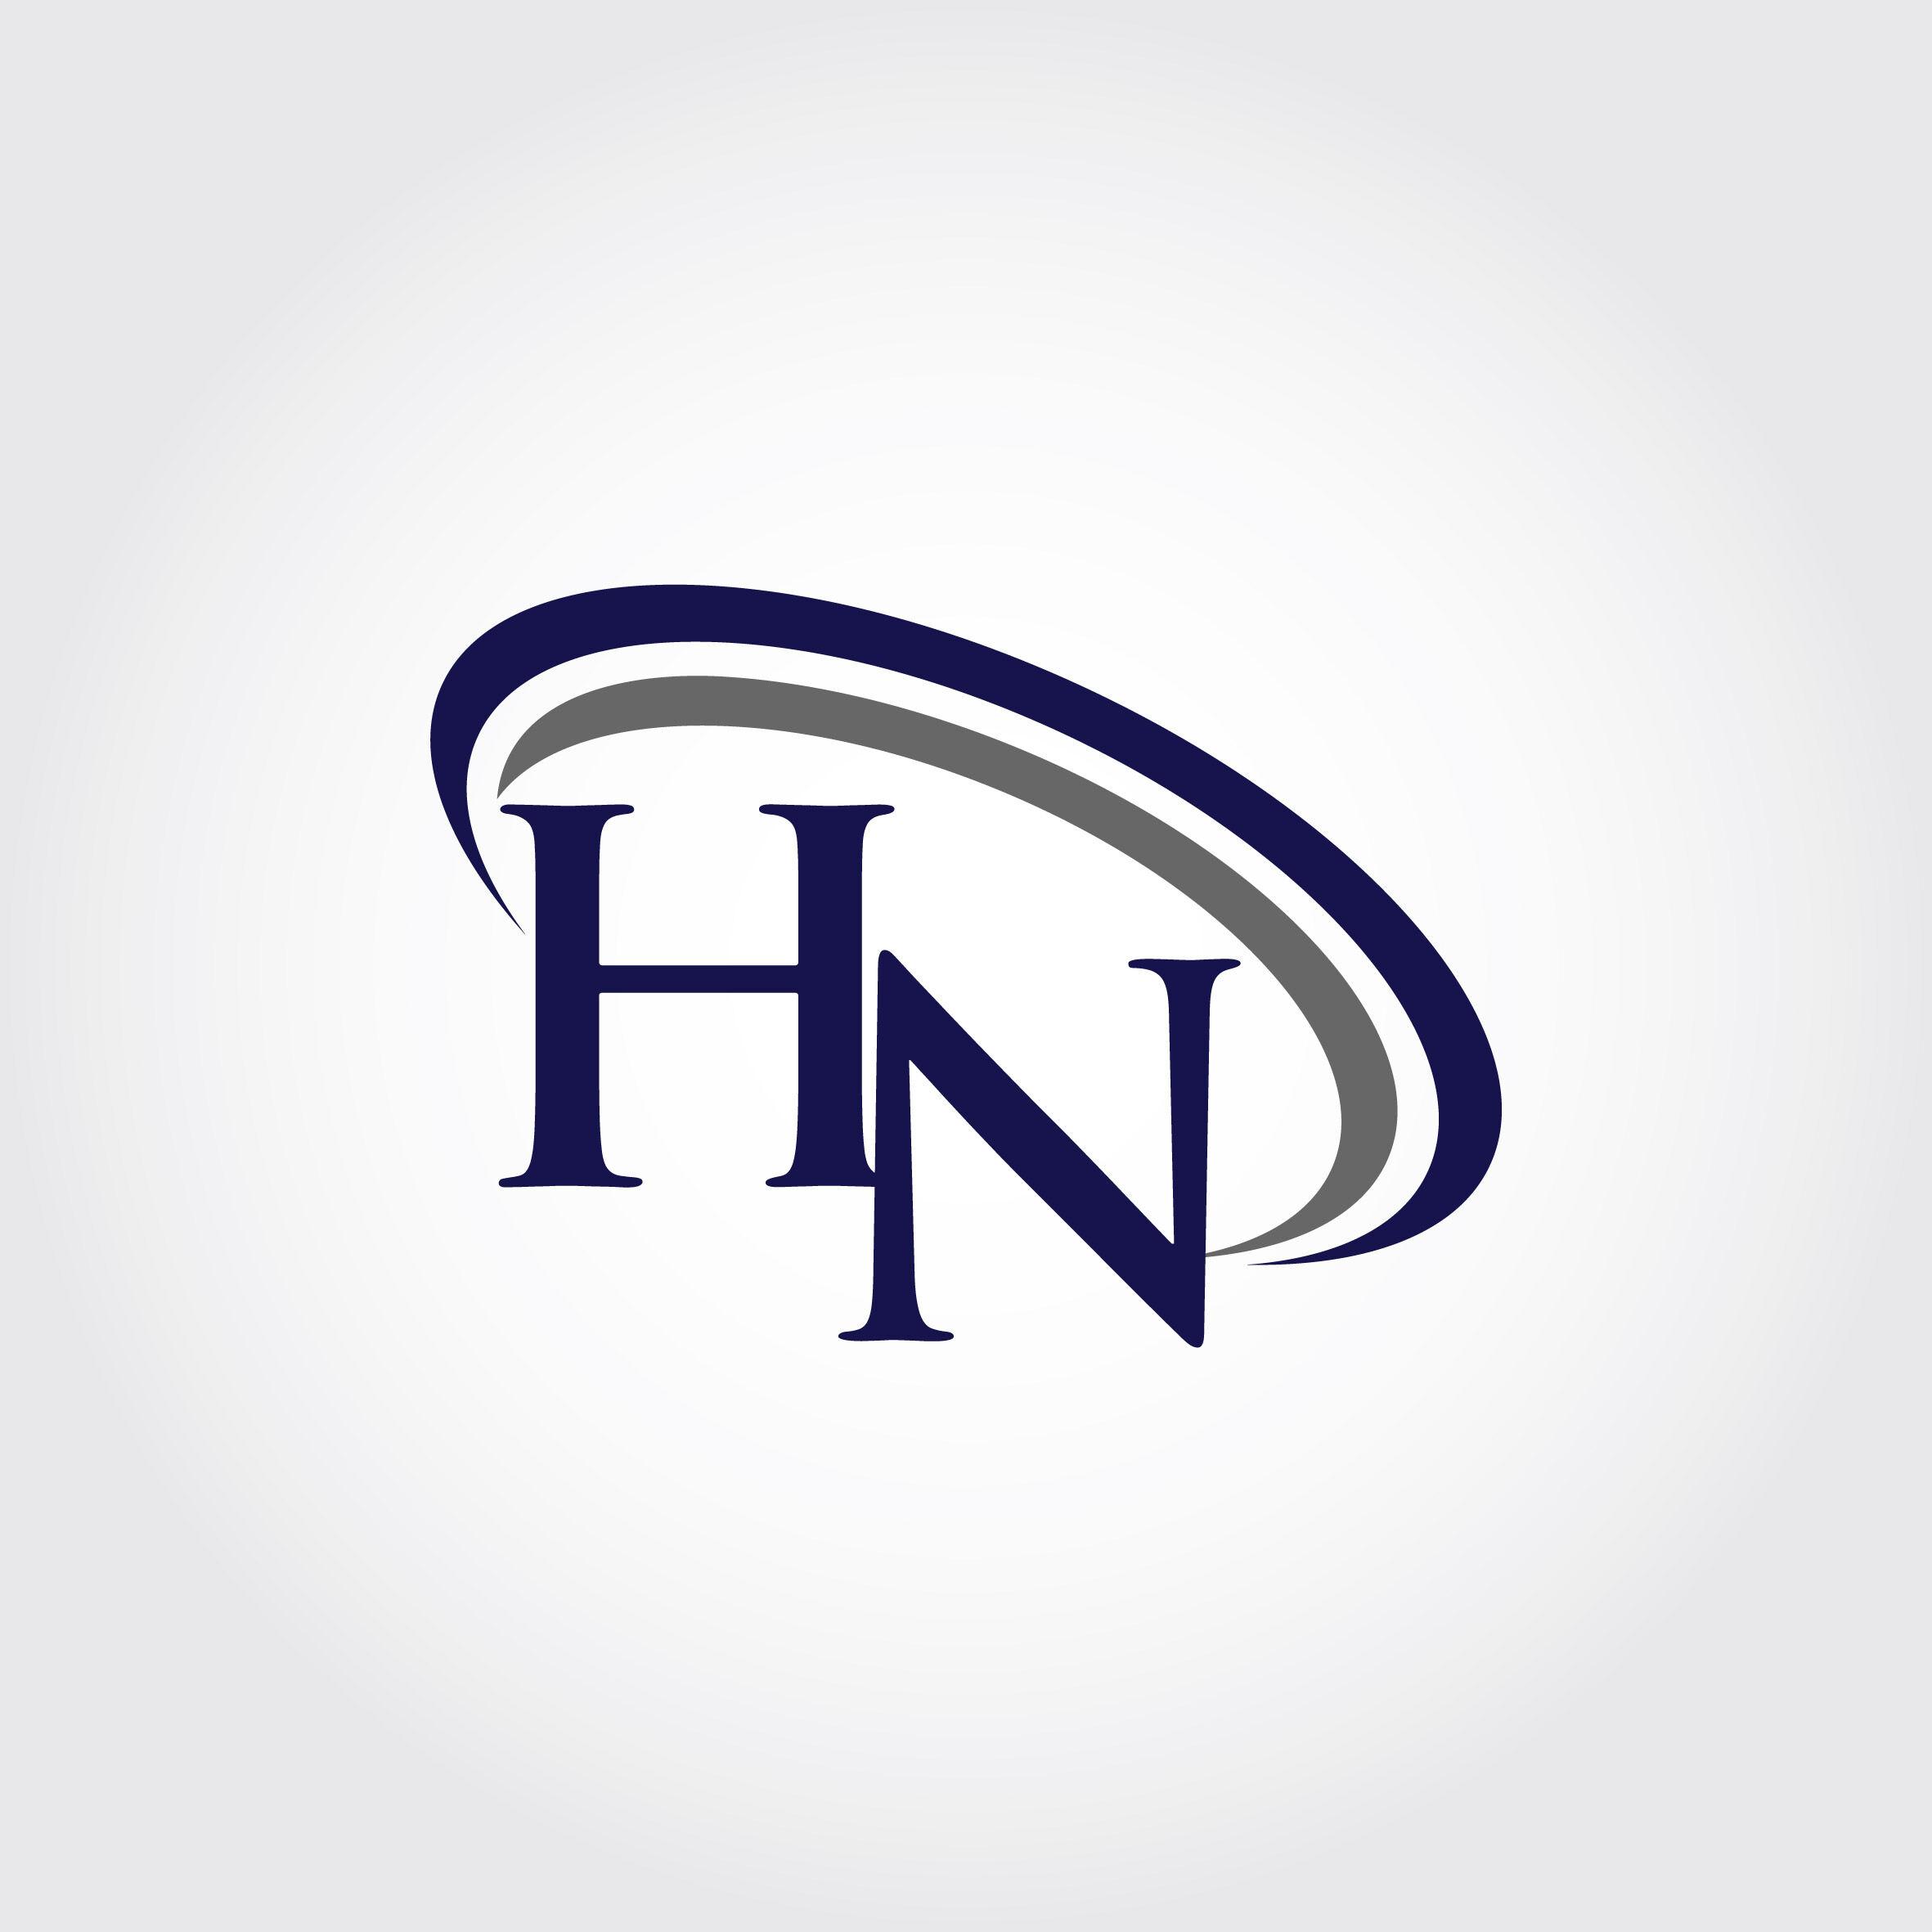 HN | Initials logo design, Minimal logos inspiration